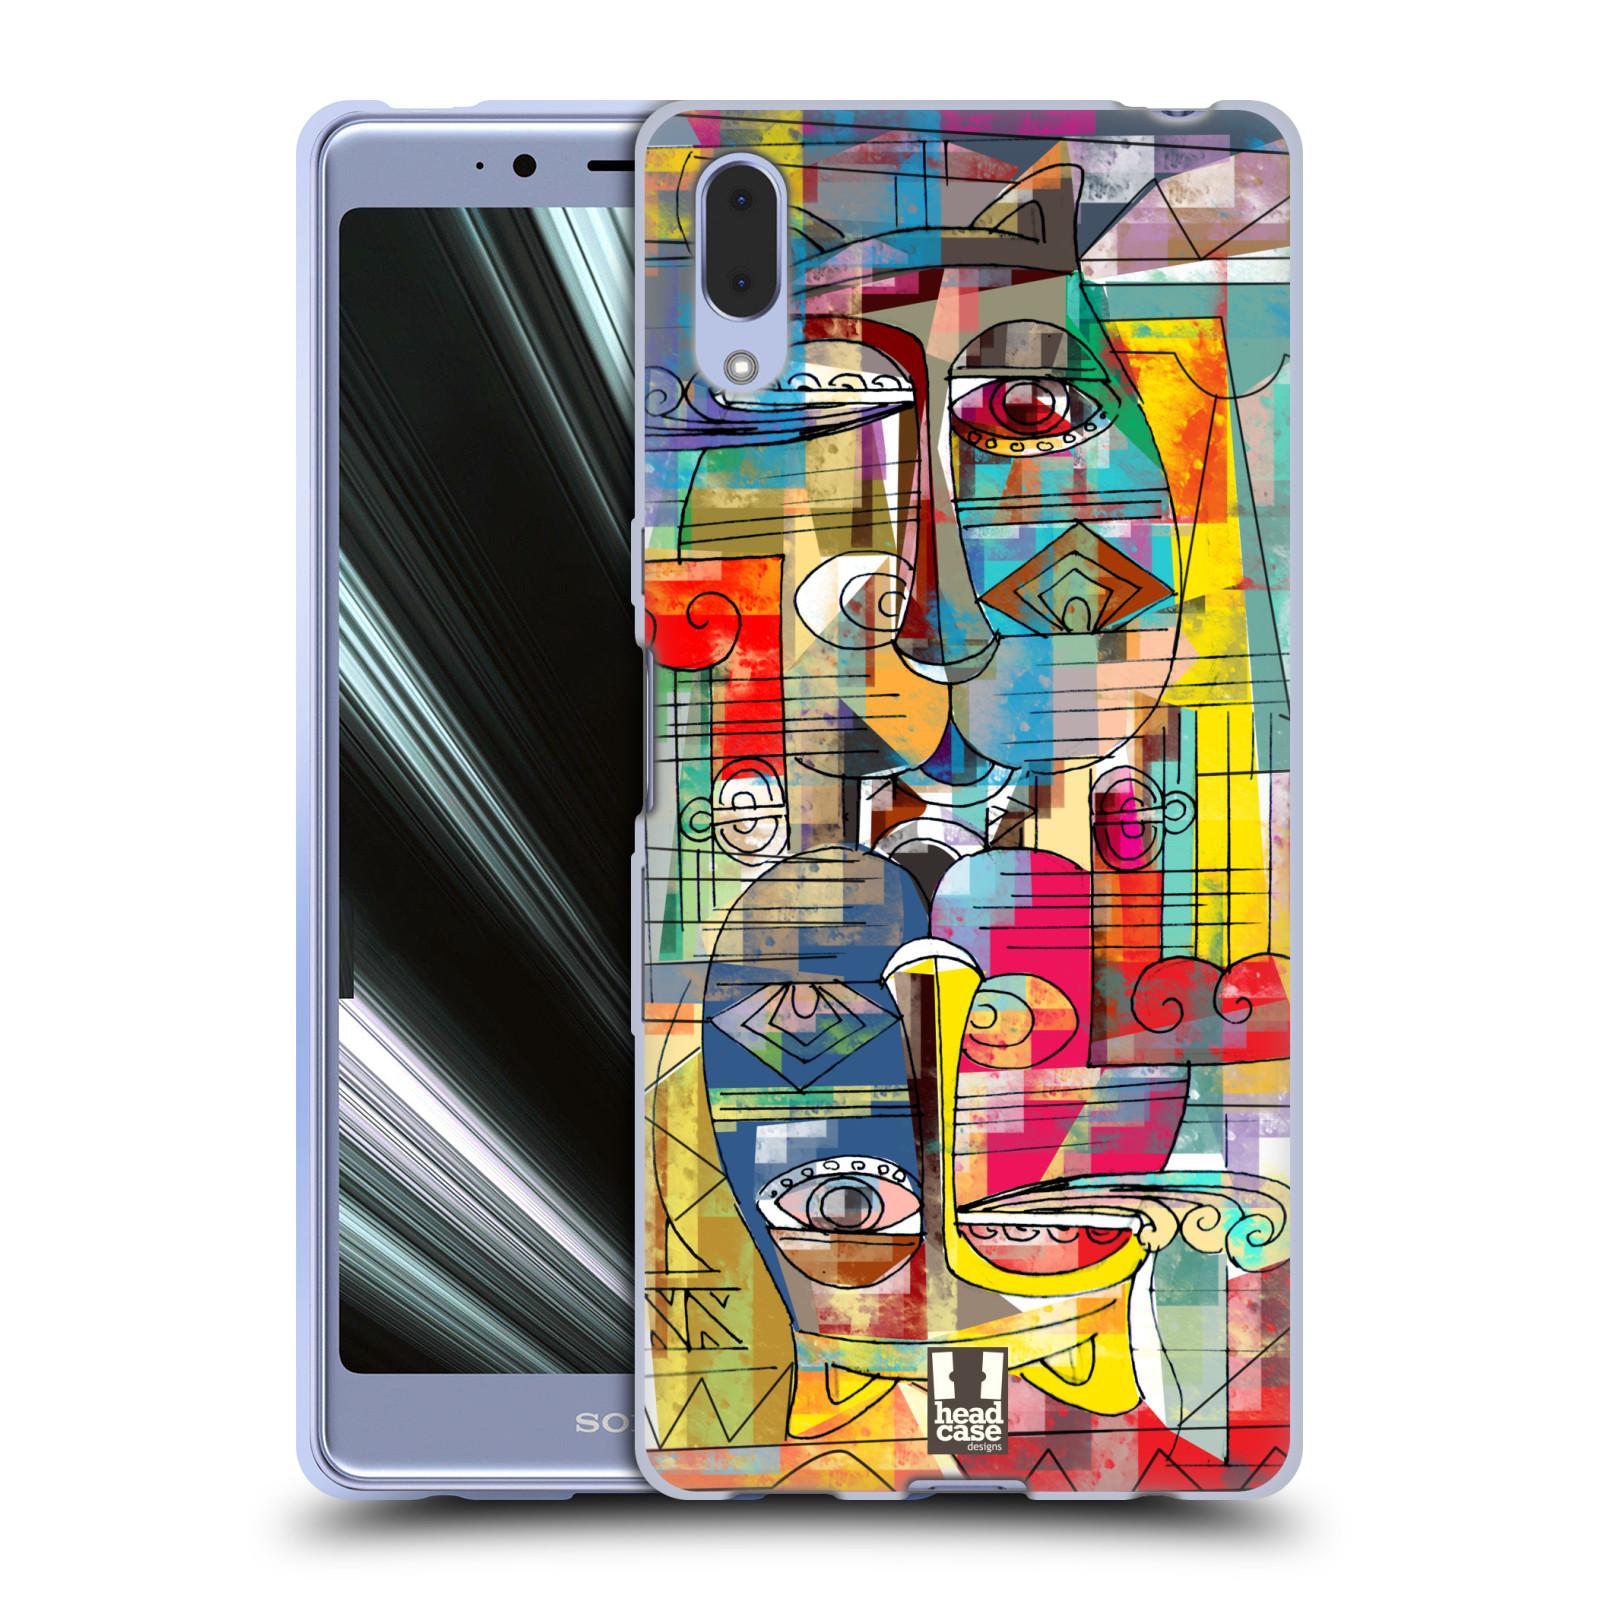 Silikonové pouzdro na mobil Sony Xperia L3 - Head Case - AZTEC MANX